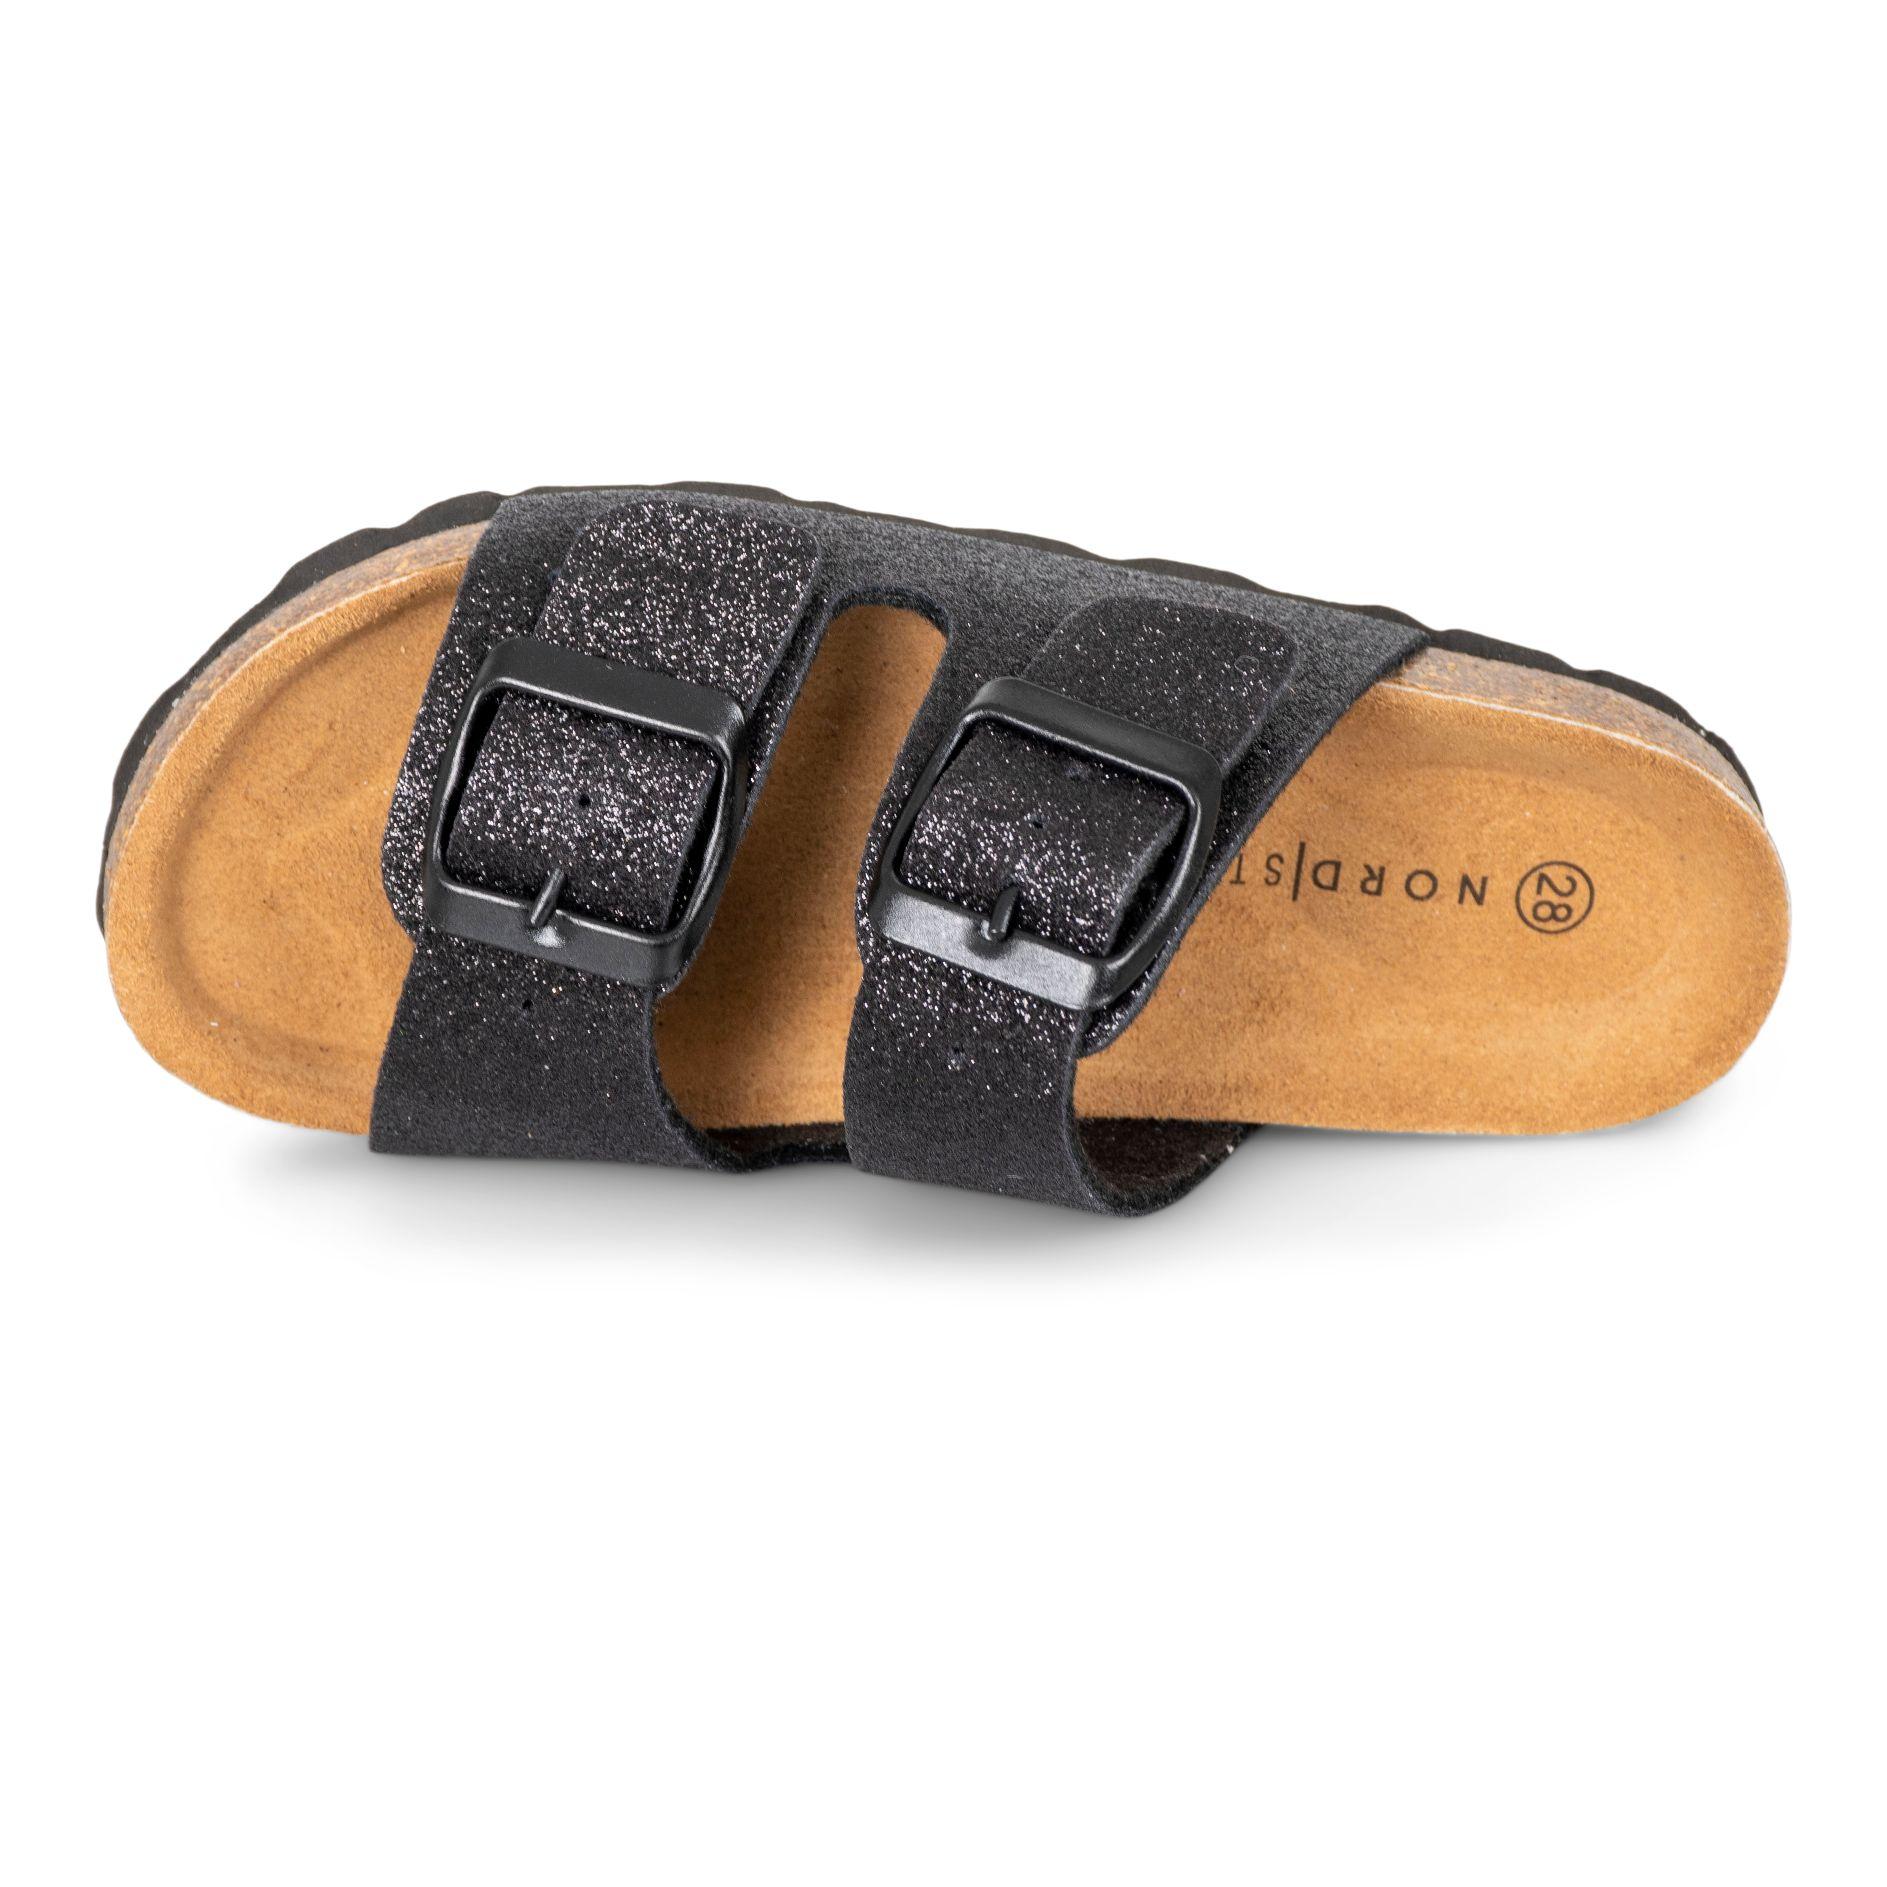 Nordstrand 747 sandal, blackglitter, 27